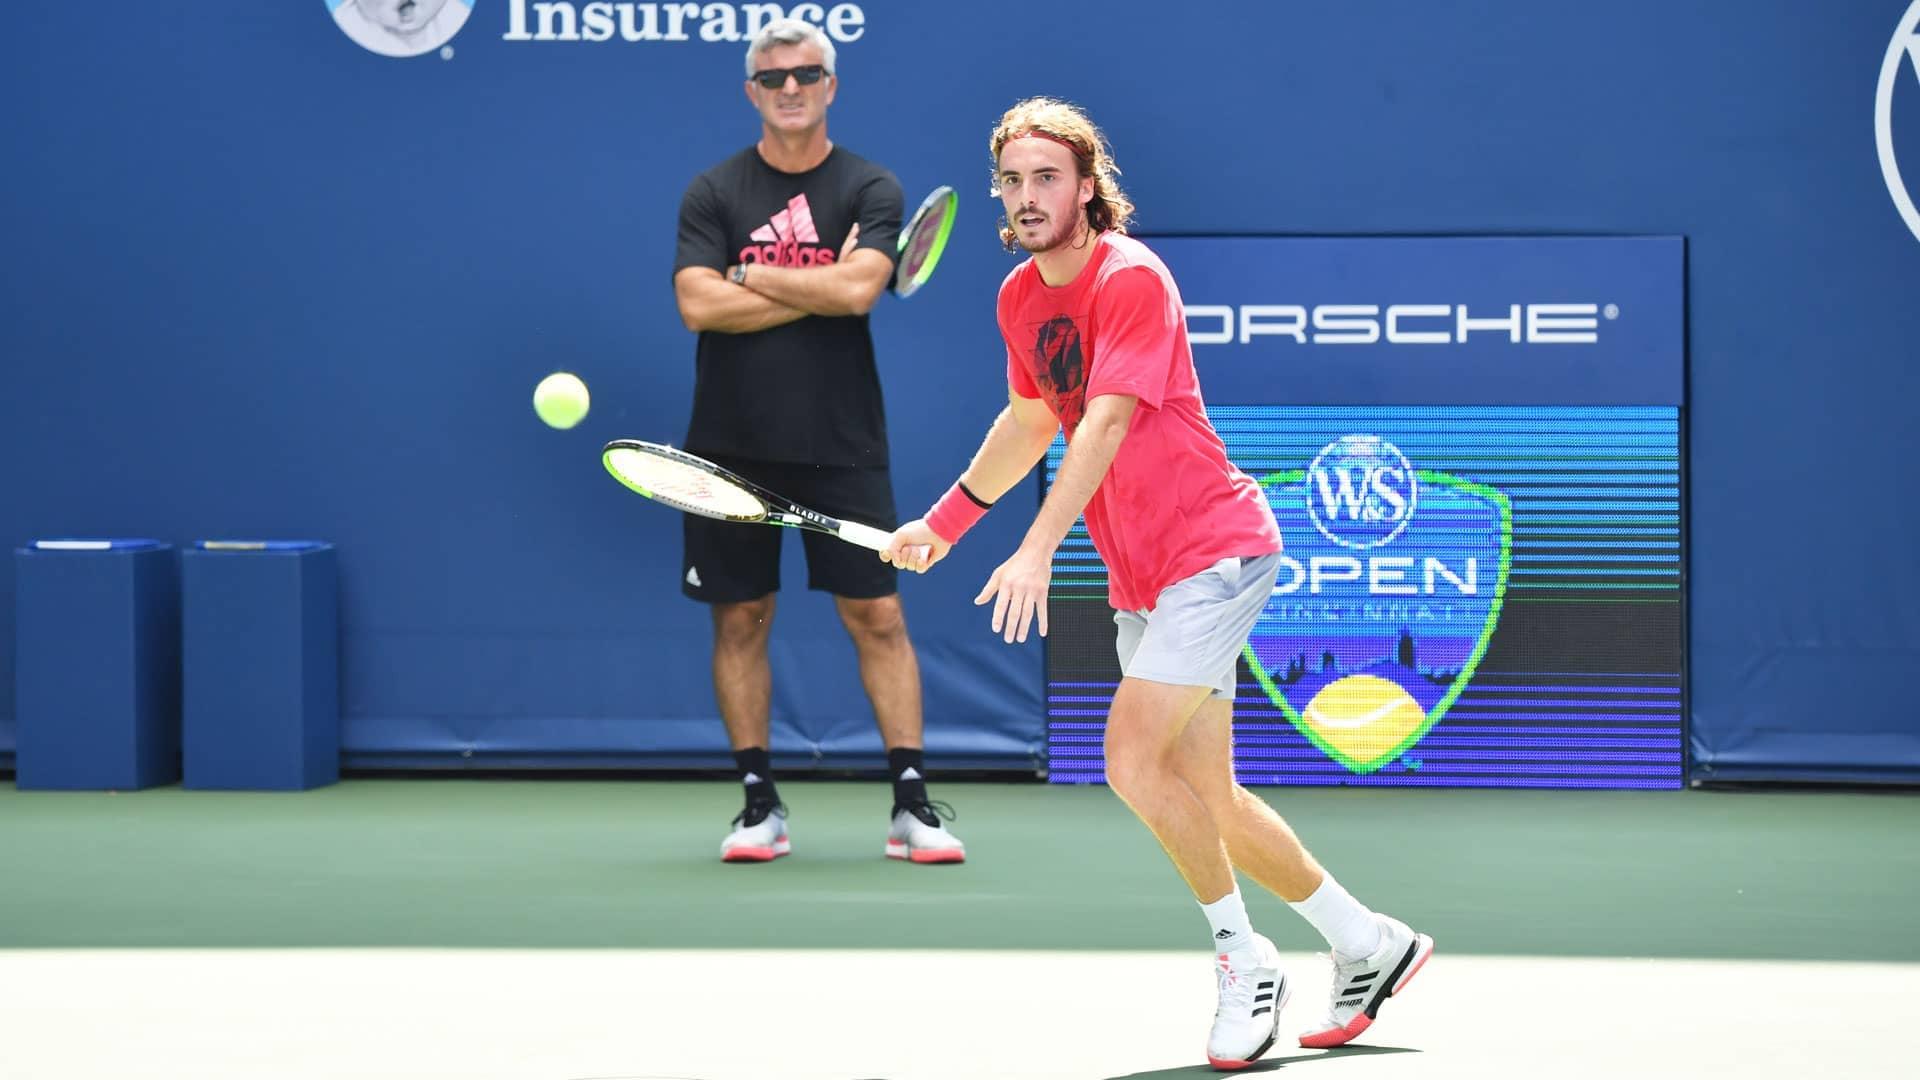 Apostolos Tsitsipas Embracing His Life Teacher Role For Stefanos Atp Tour Tennis